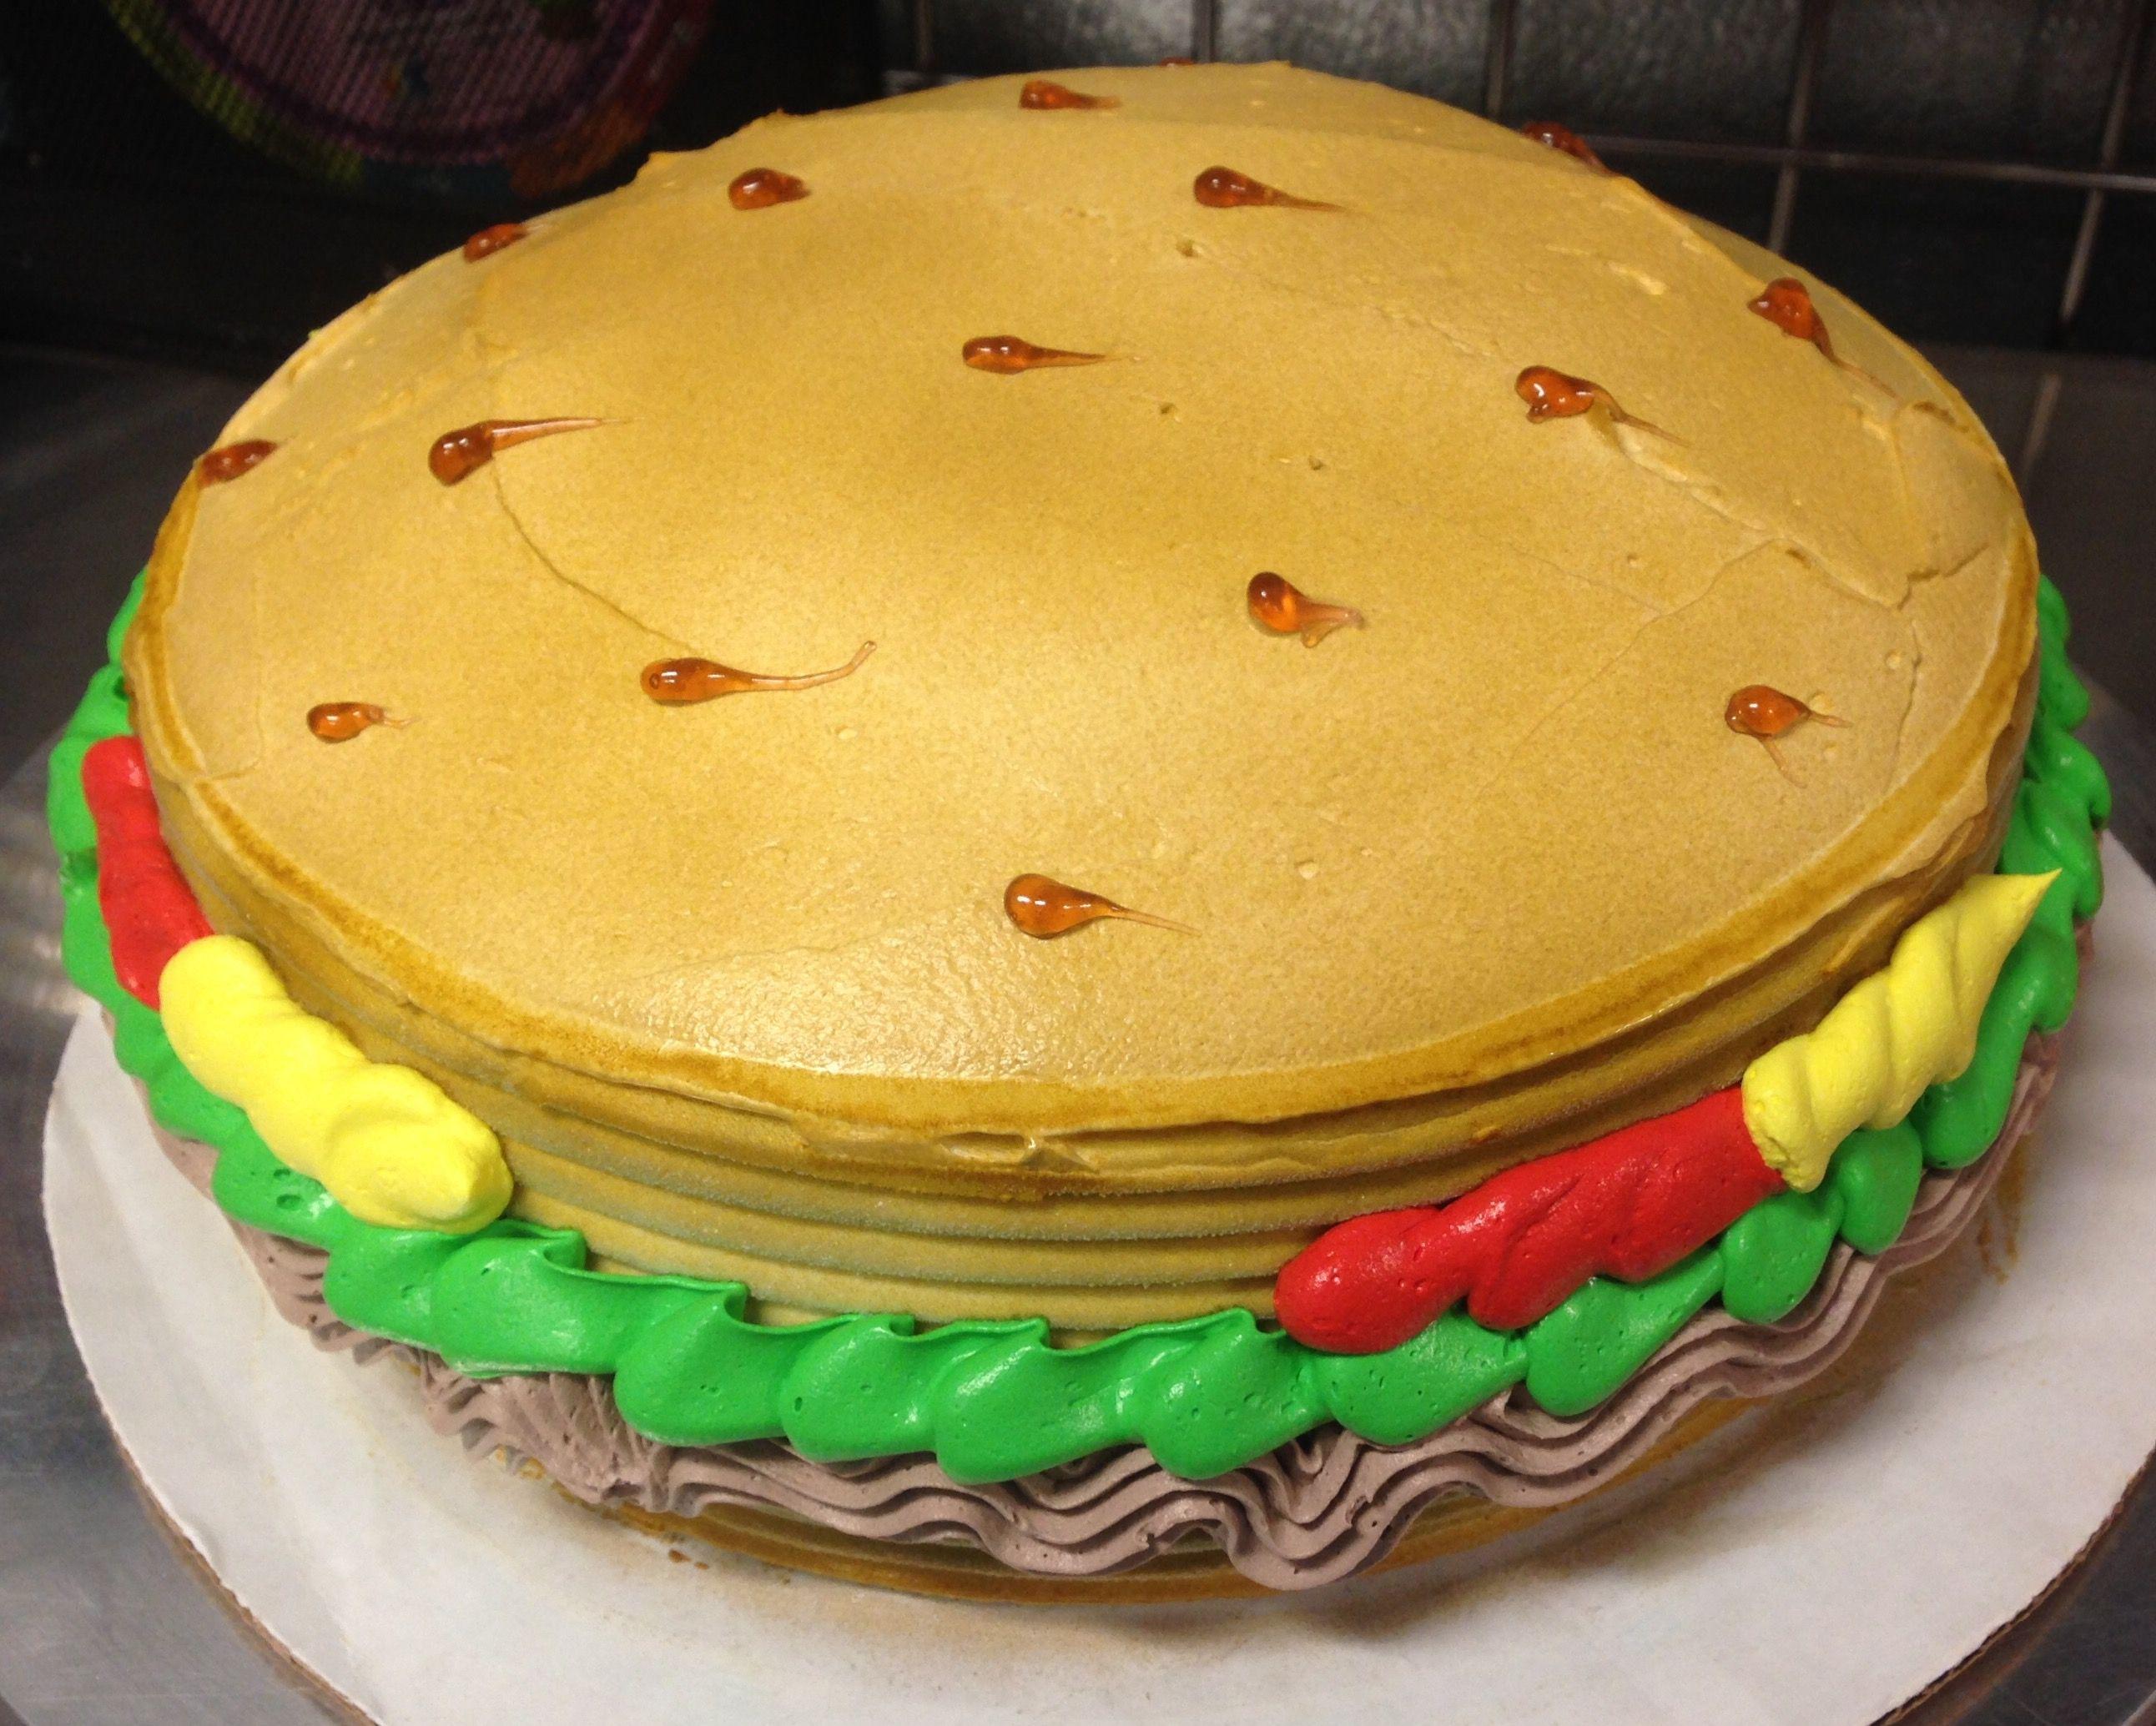 Burger dq ice cream cake my cakes pinterest cream